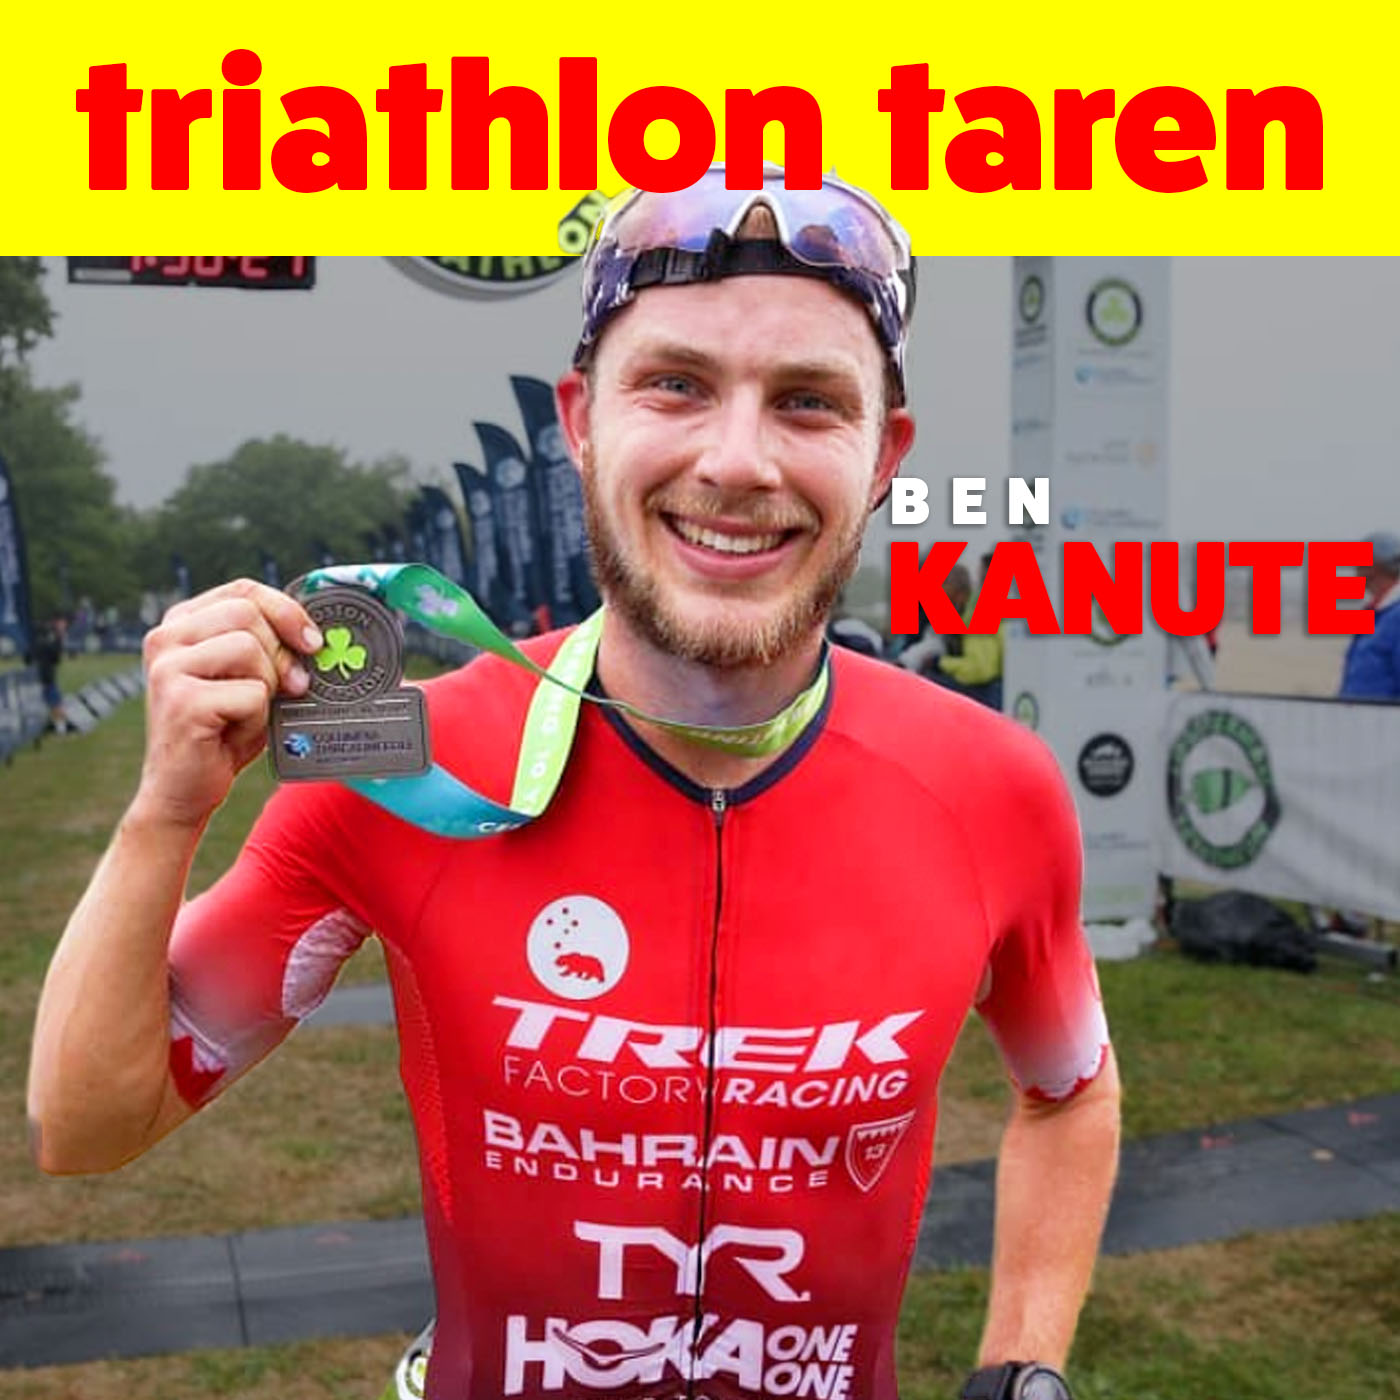 Ben Kanute | Professional Triathlete and Future World Champion?